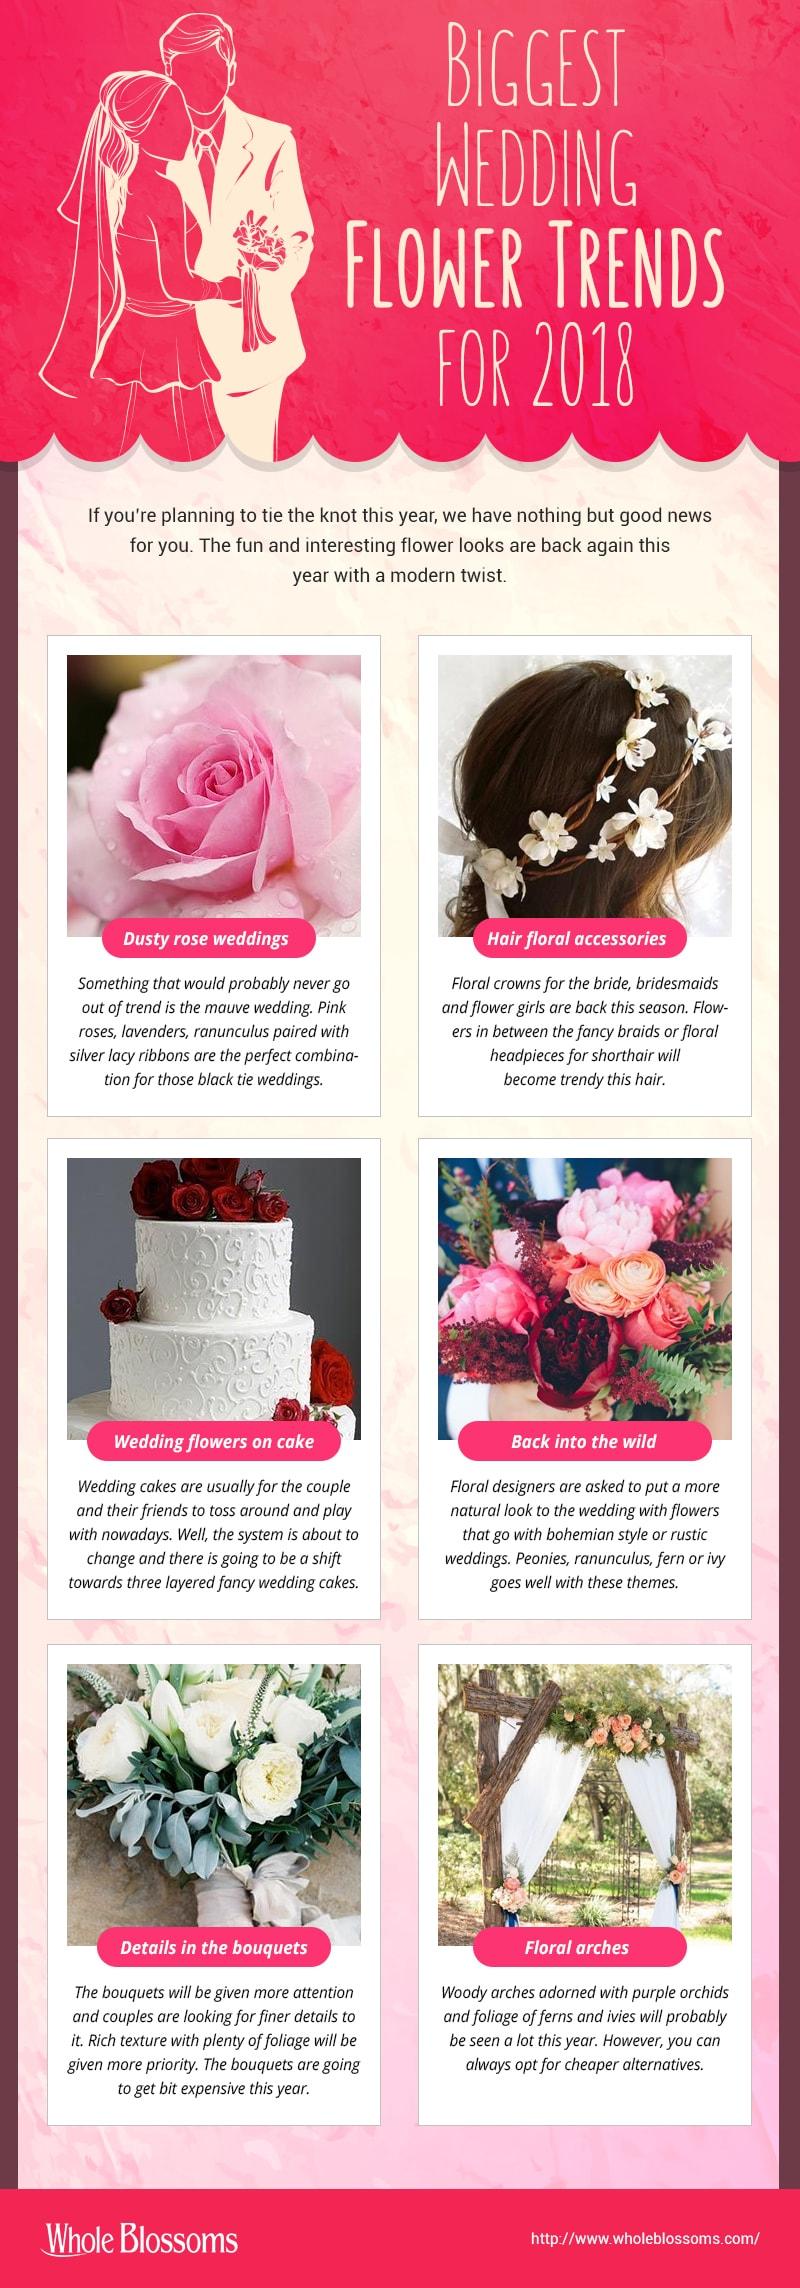 Biggest Wedding Flower Trends for 2018